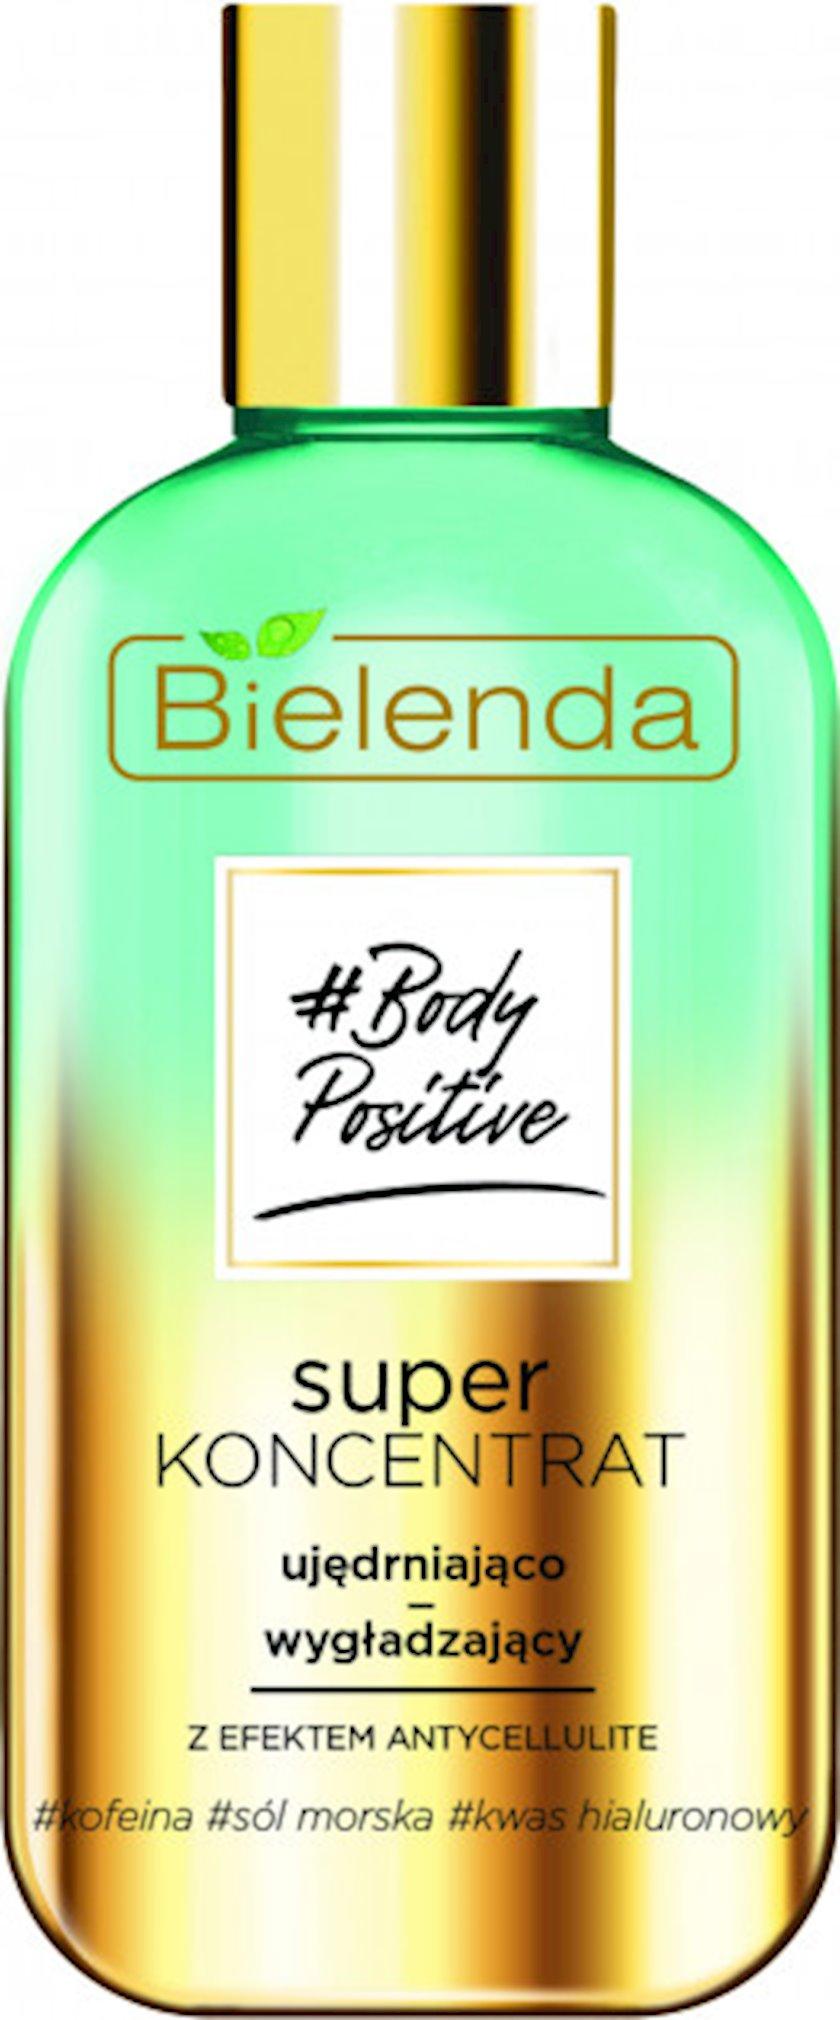 Superkonsentrat Bielenda Body Positive hamarlaşdırıcı serum antiselülit effekti ilə 250 ml